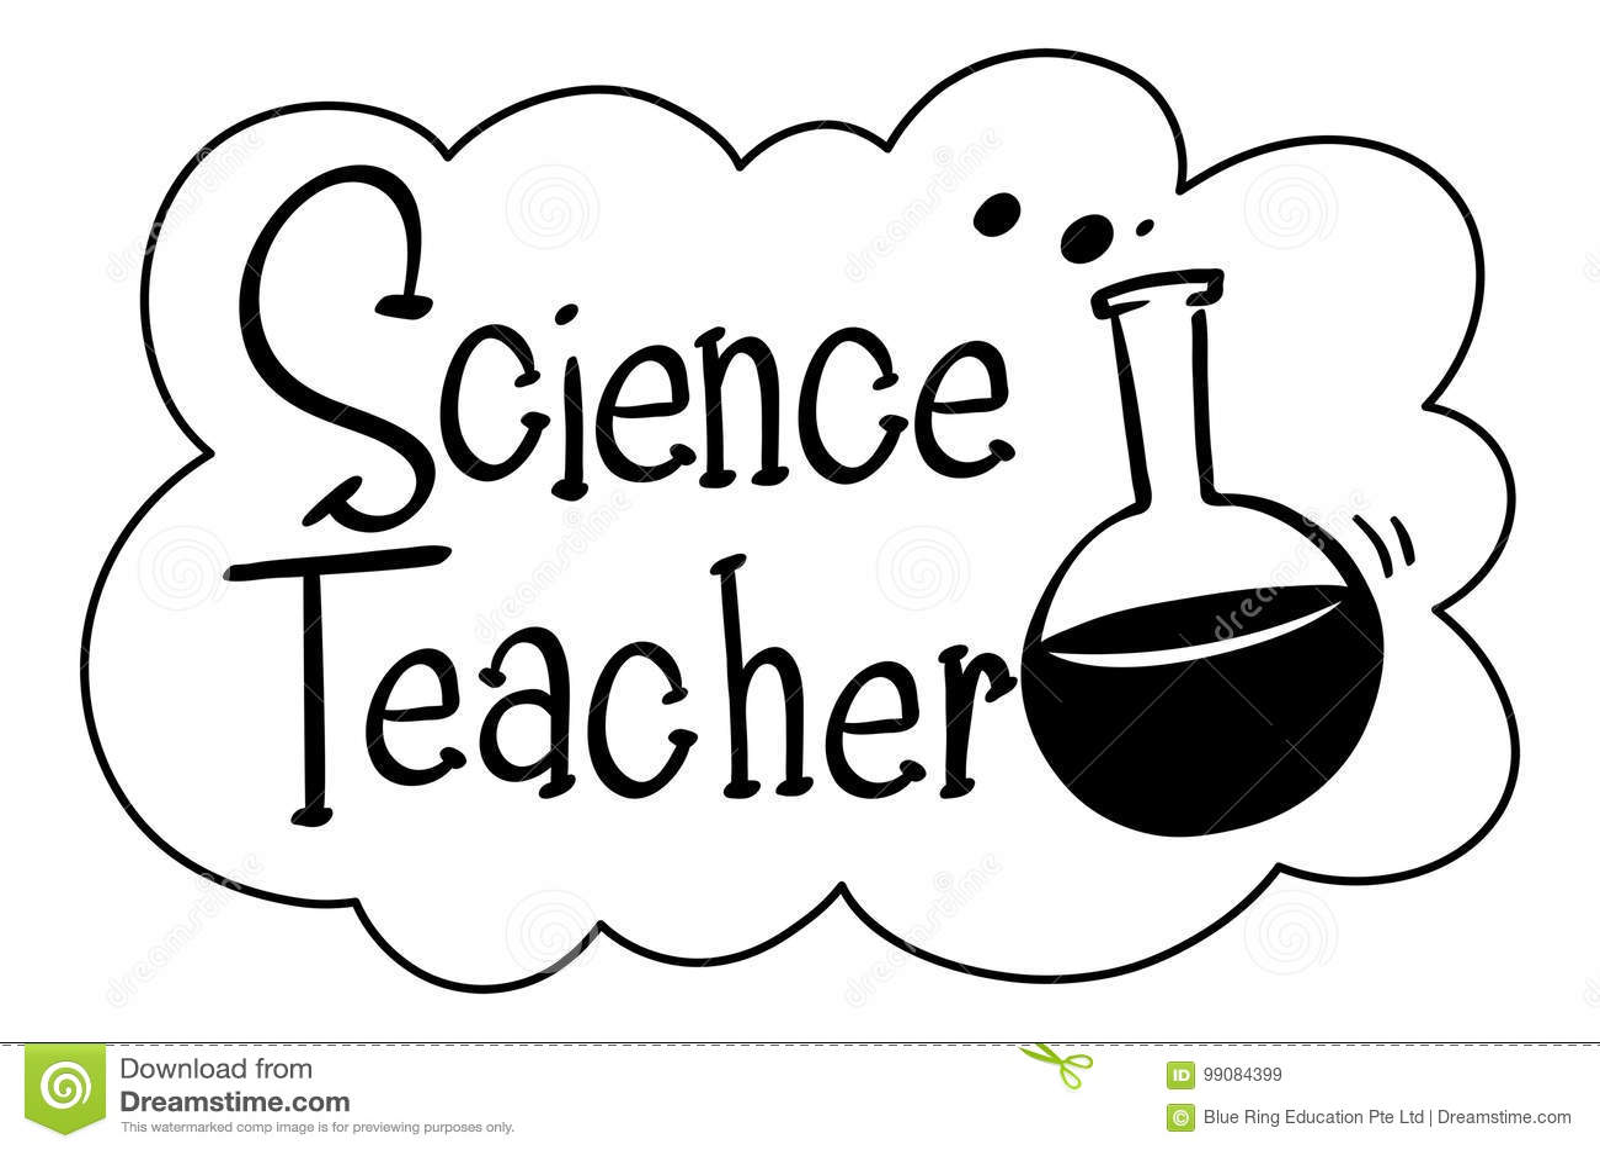 English Phrase For Science Teacher Stock Vector